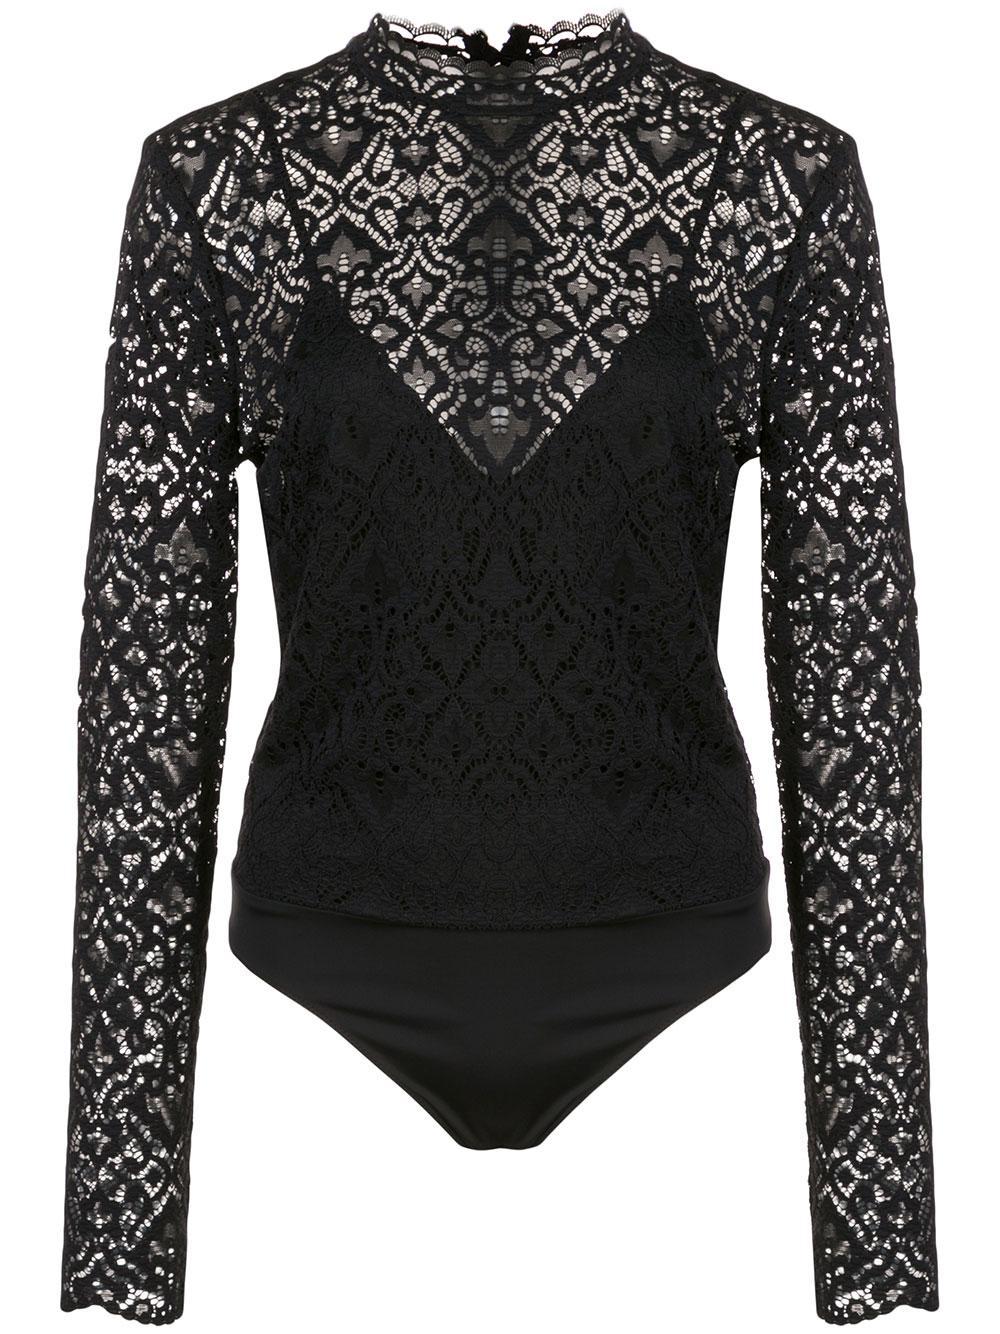 Long Sleeve Multimedia Lace Cami Bodysuit